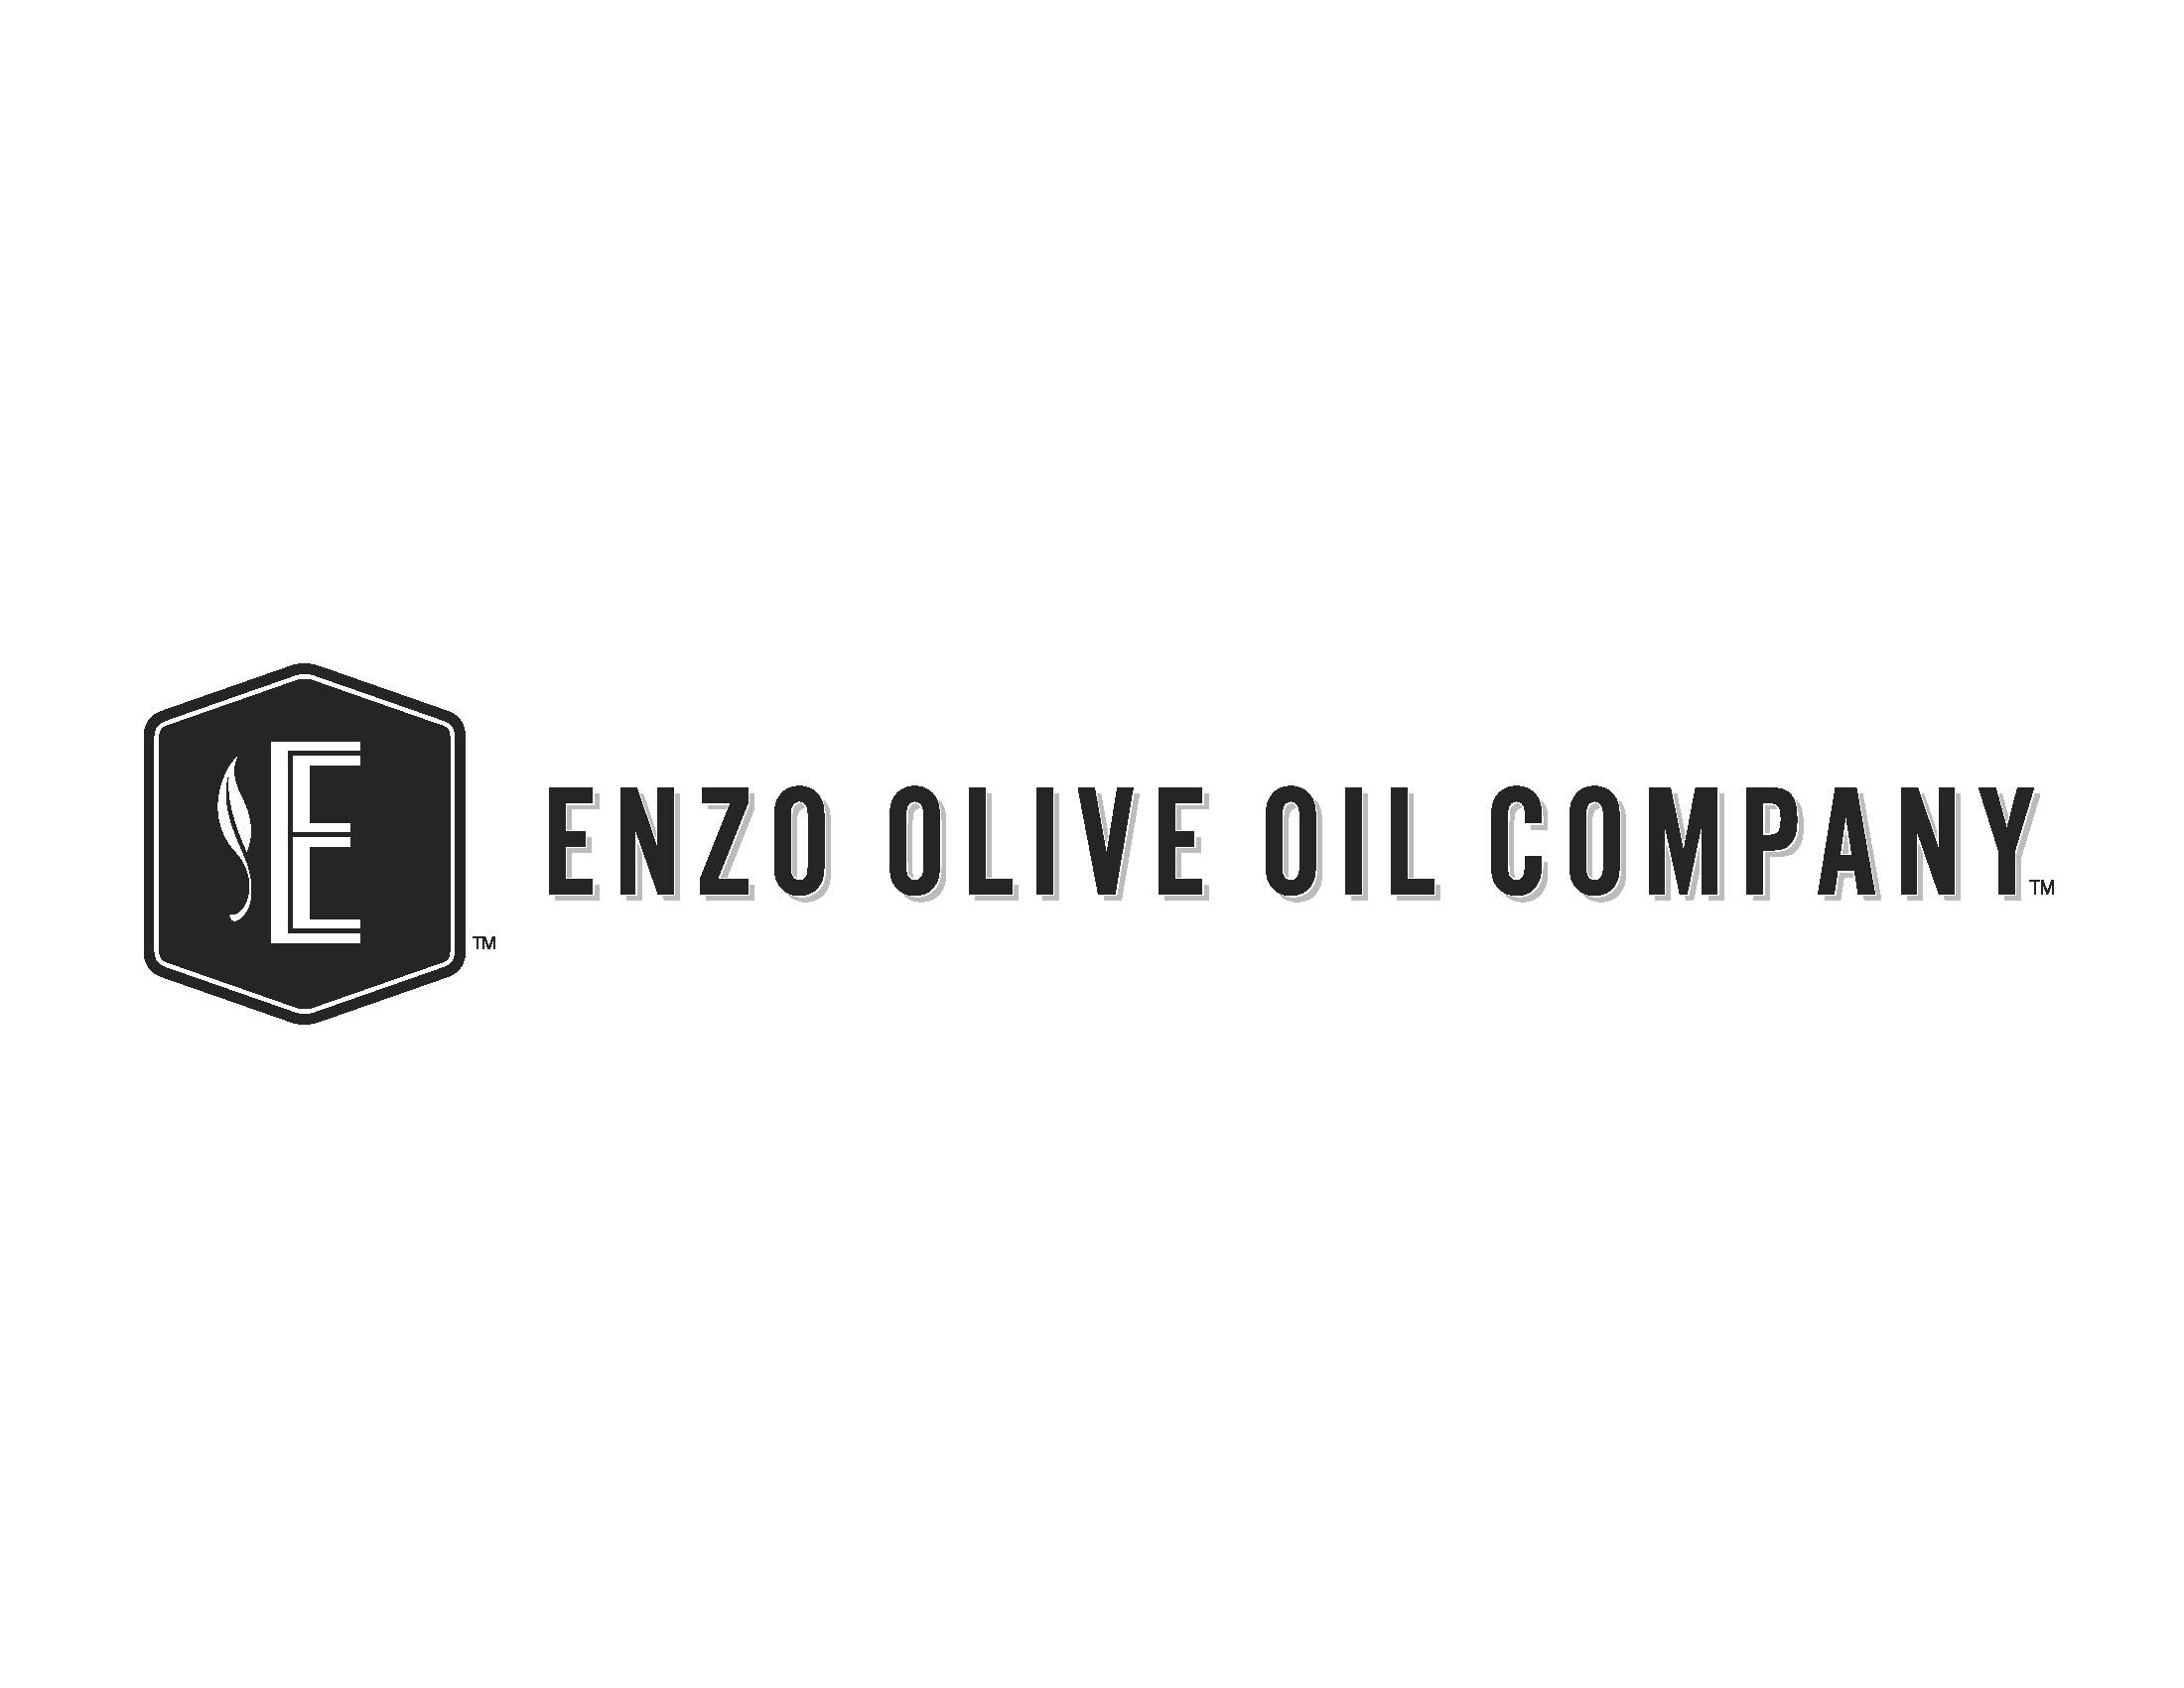 enzo olive oil